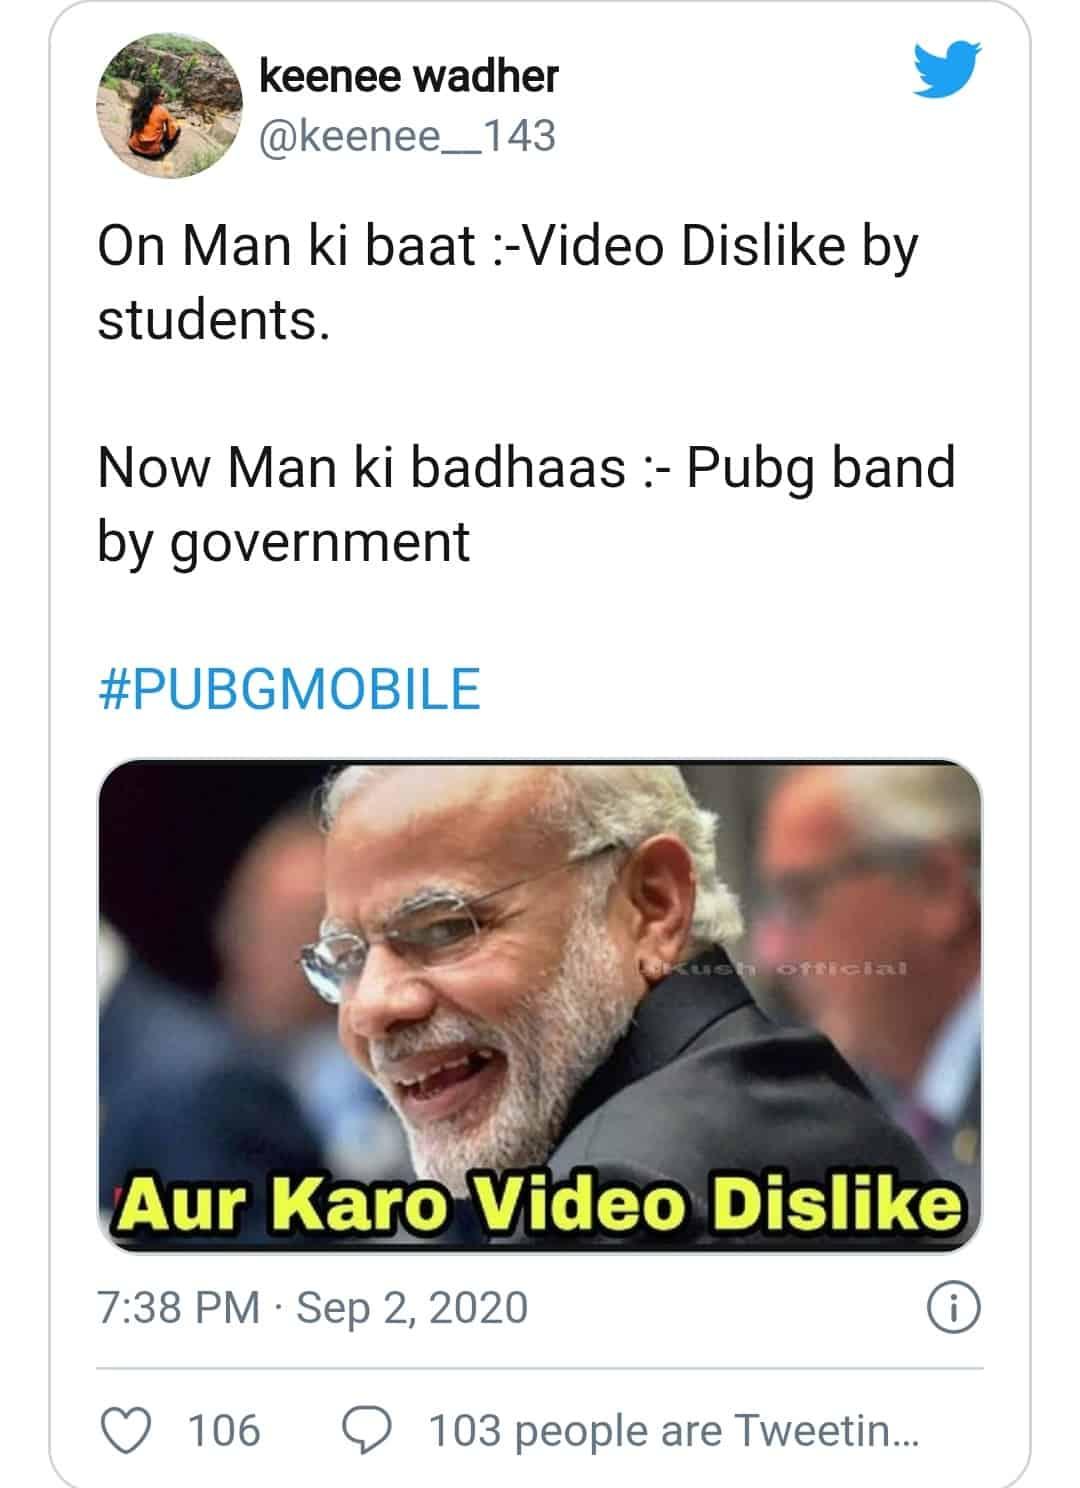 PUBG ban (man ki badhas